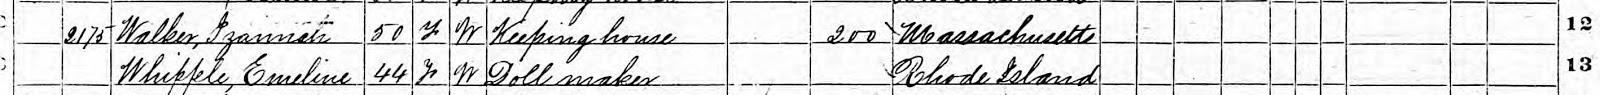 Izannah Walker 1870 Census detail